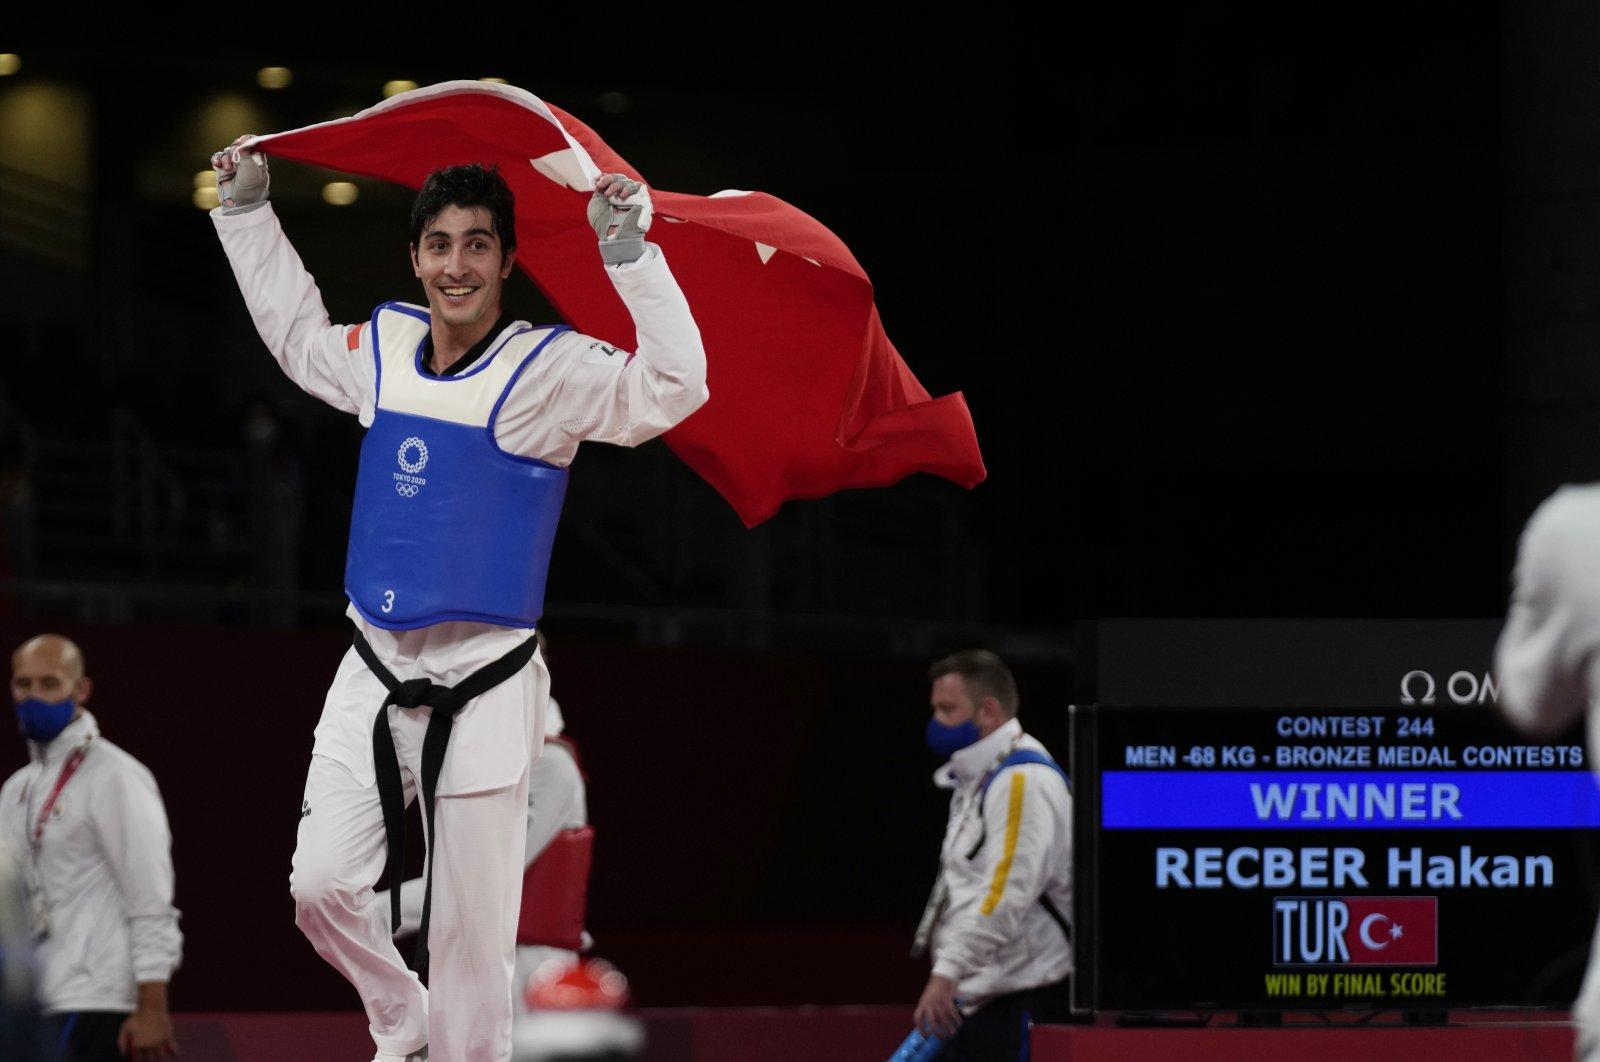 Turkey's Hakan Reçber celebrates with the national flag after winning bronze in the taekwondo men's 68-kilogram match at the Tokyo 2020 Olympics, Tokyo, Japan, July 25, 2021. (AP Photo)